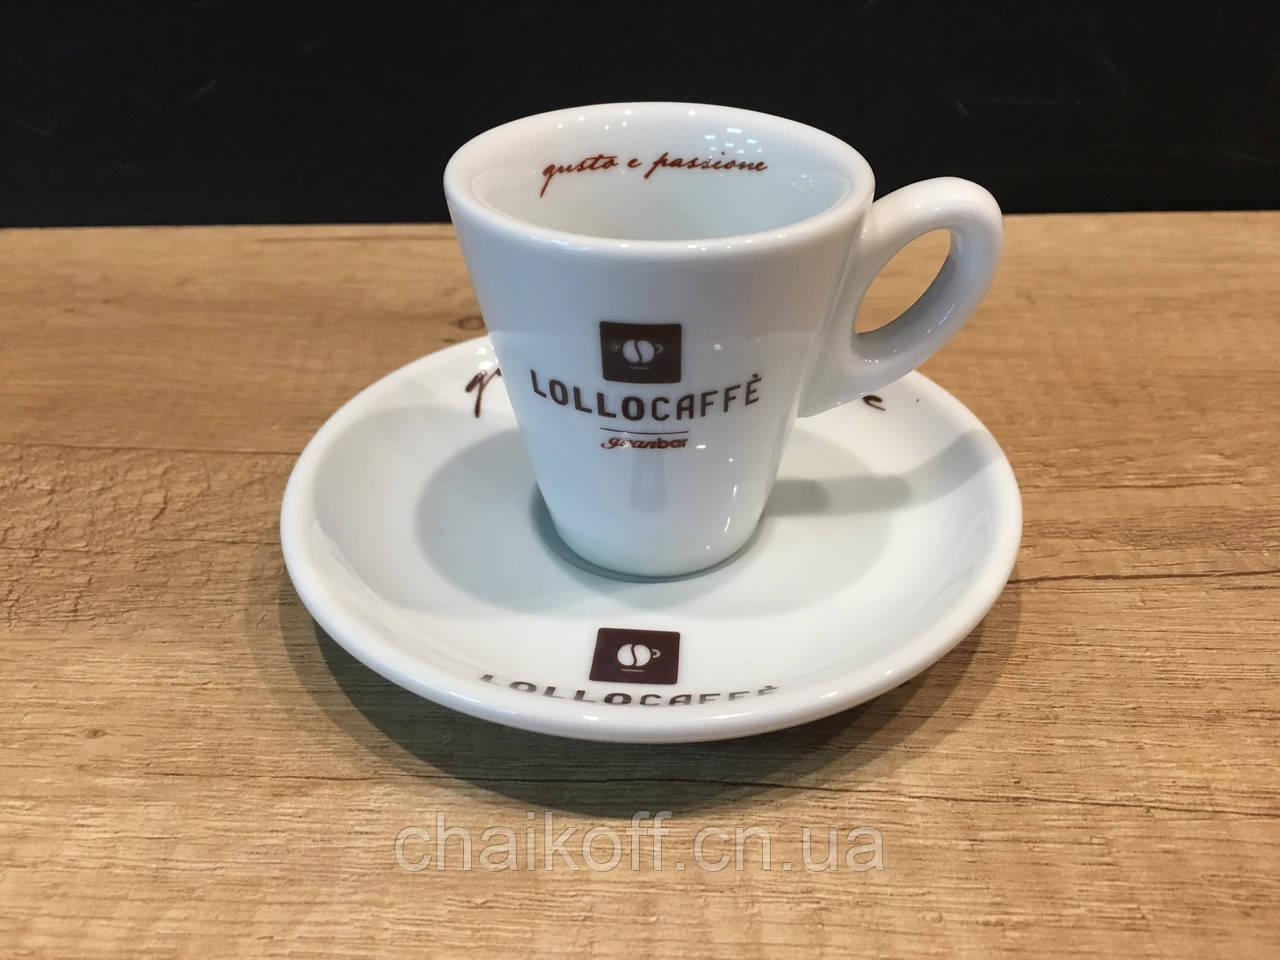 Чашка с блюдцем керамика эспрессоLollo Caffe 70 мл.